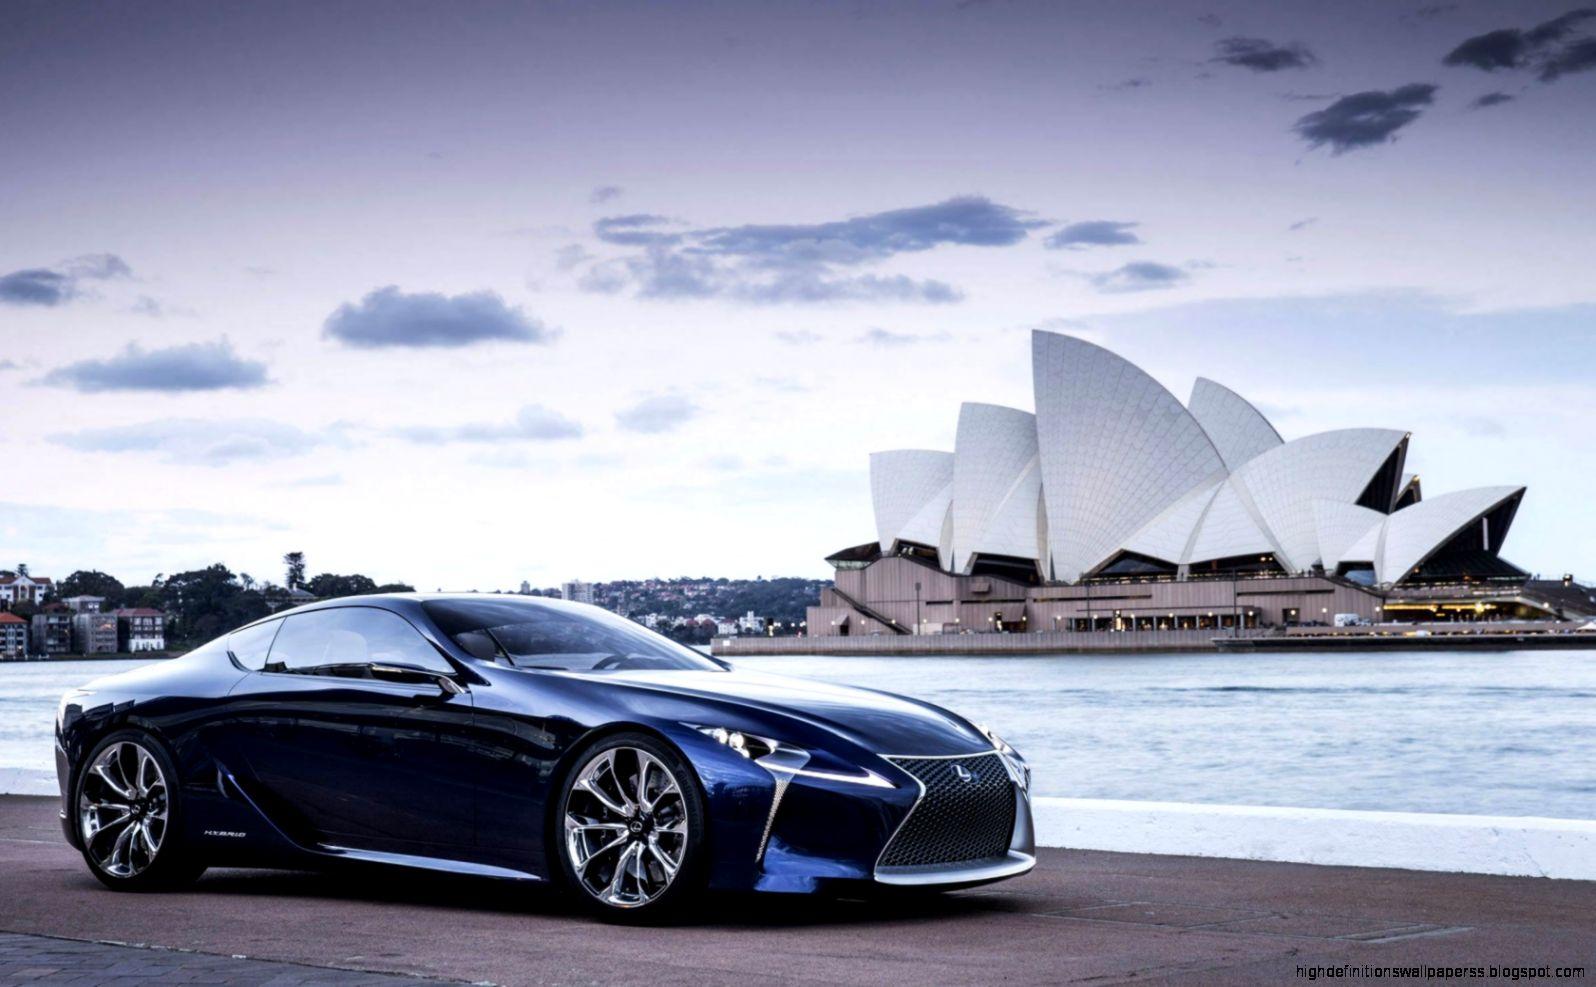 View Original Size. Lexus Car Wallpaper 14762 HD Pictures Top Wallpaper  Desktop